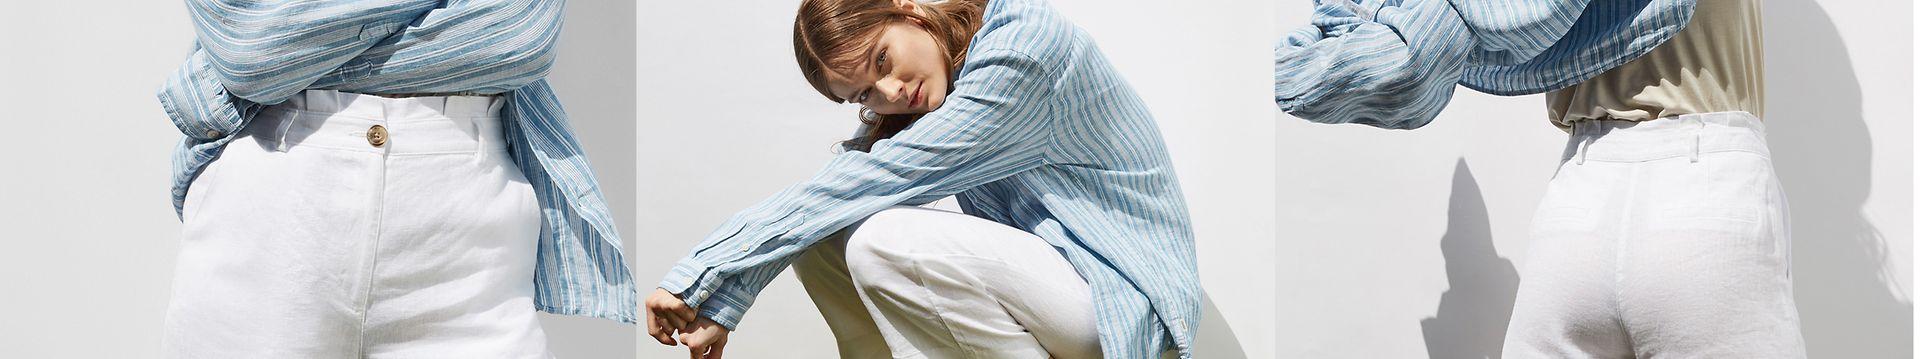 182021 - women - tc banner - pants - IMG